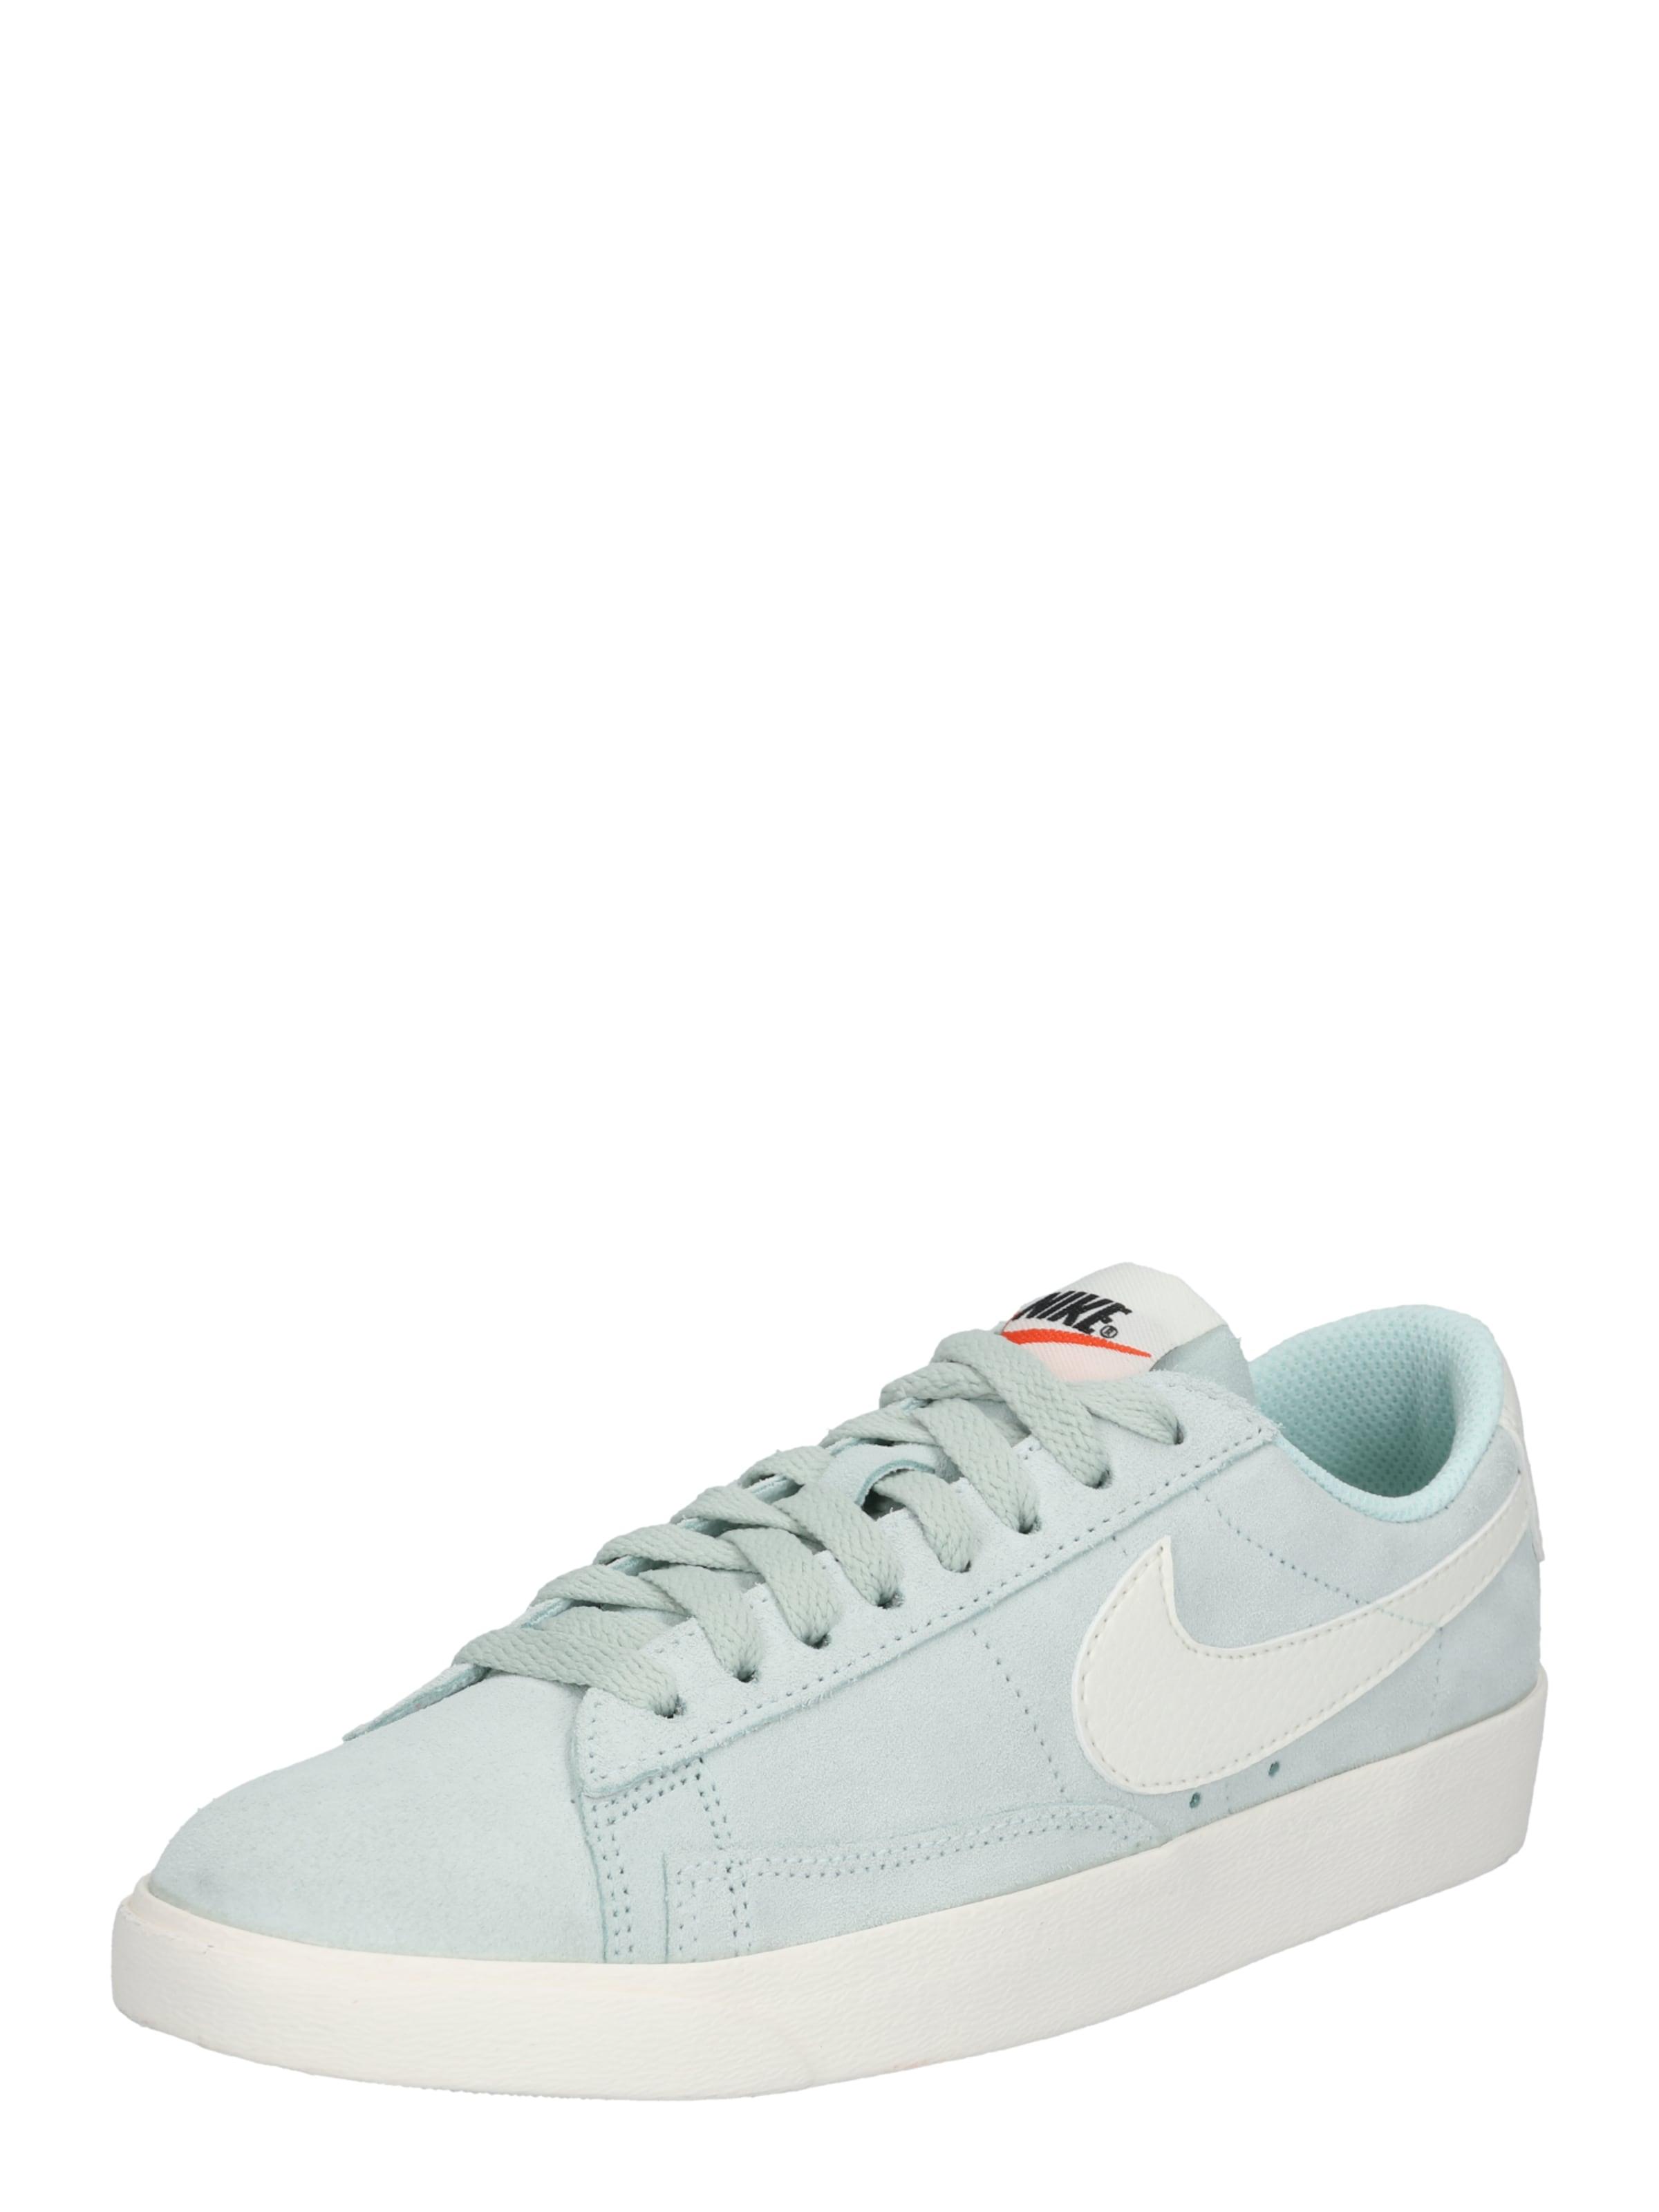 Nike Sportswear Sportswear Nike | Turnschuhe BLAZER LOW c679f3